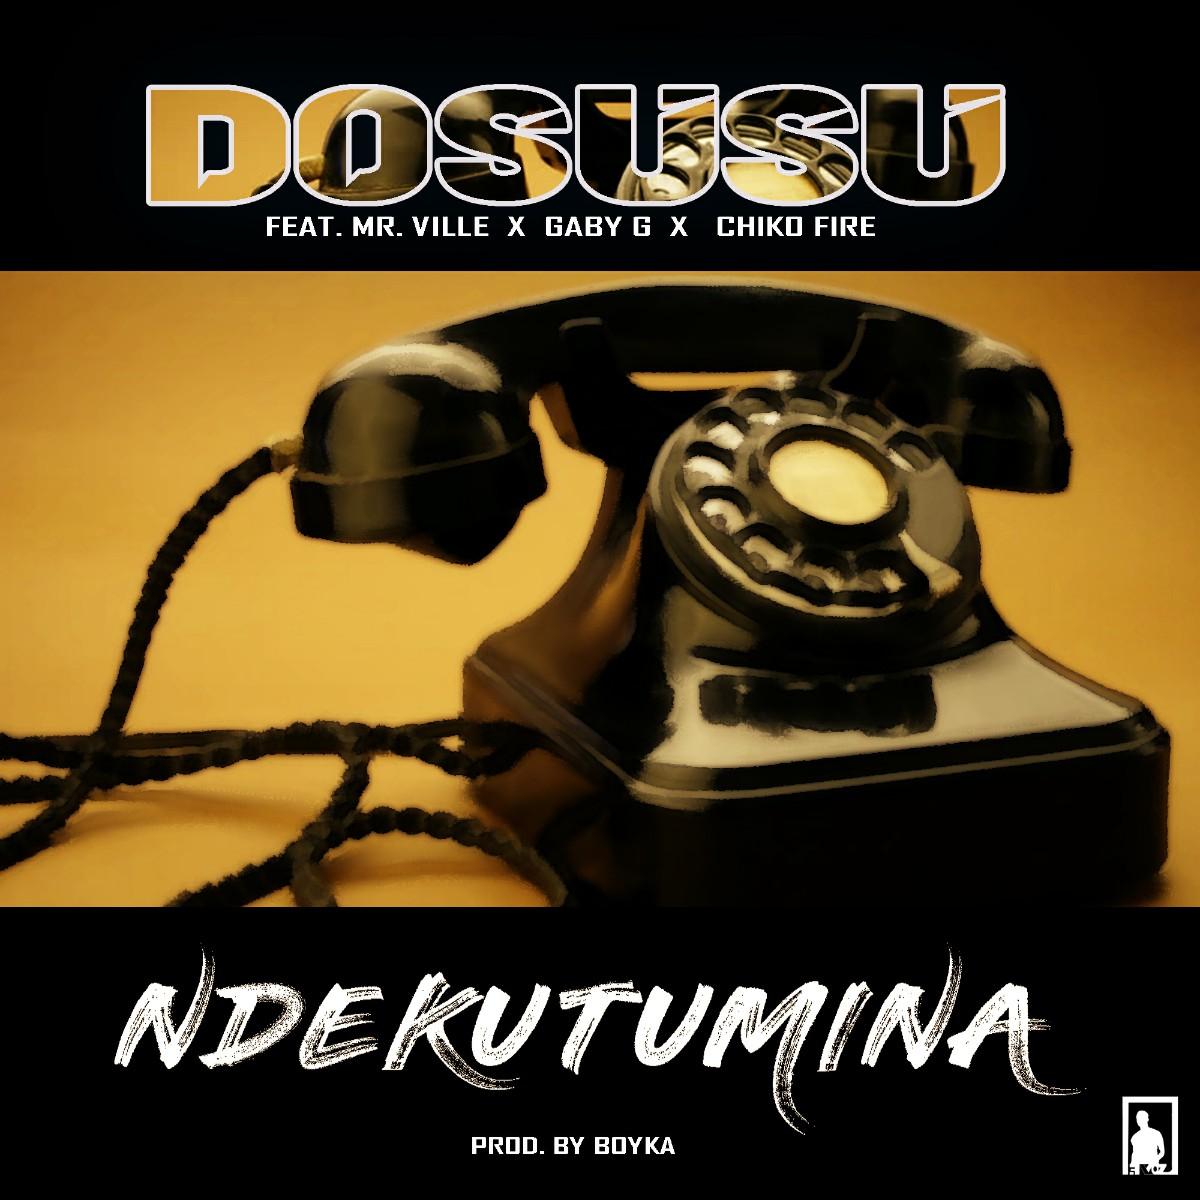 Dosusu ft. Mr Ville, GabyG & Chiko Fire - Ndekutumina